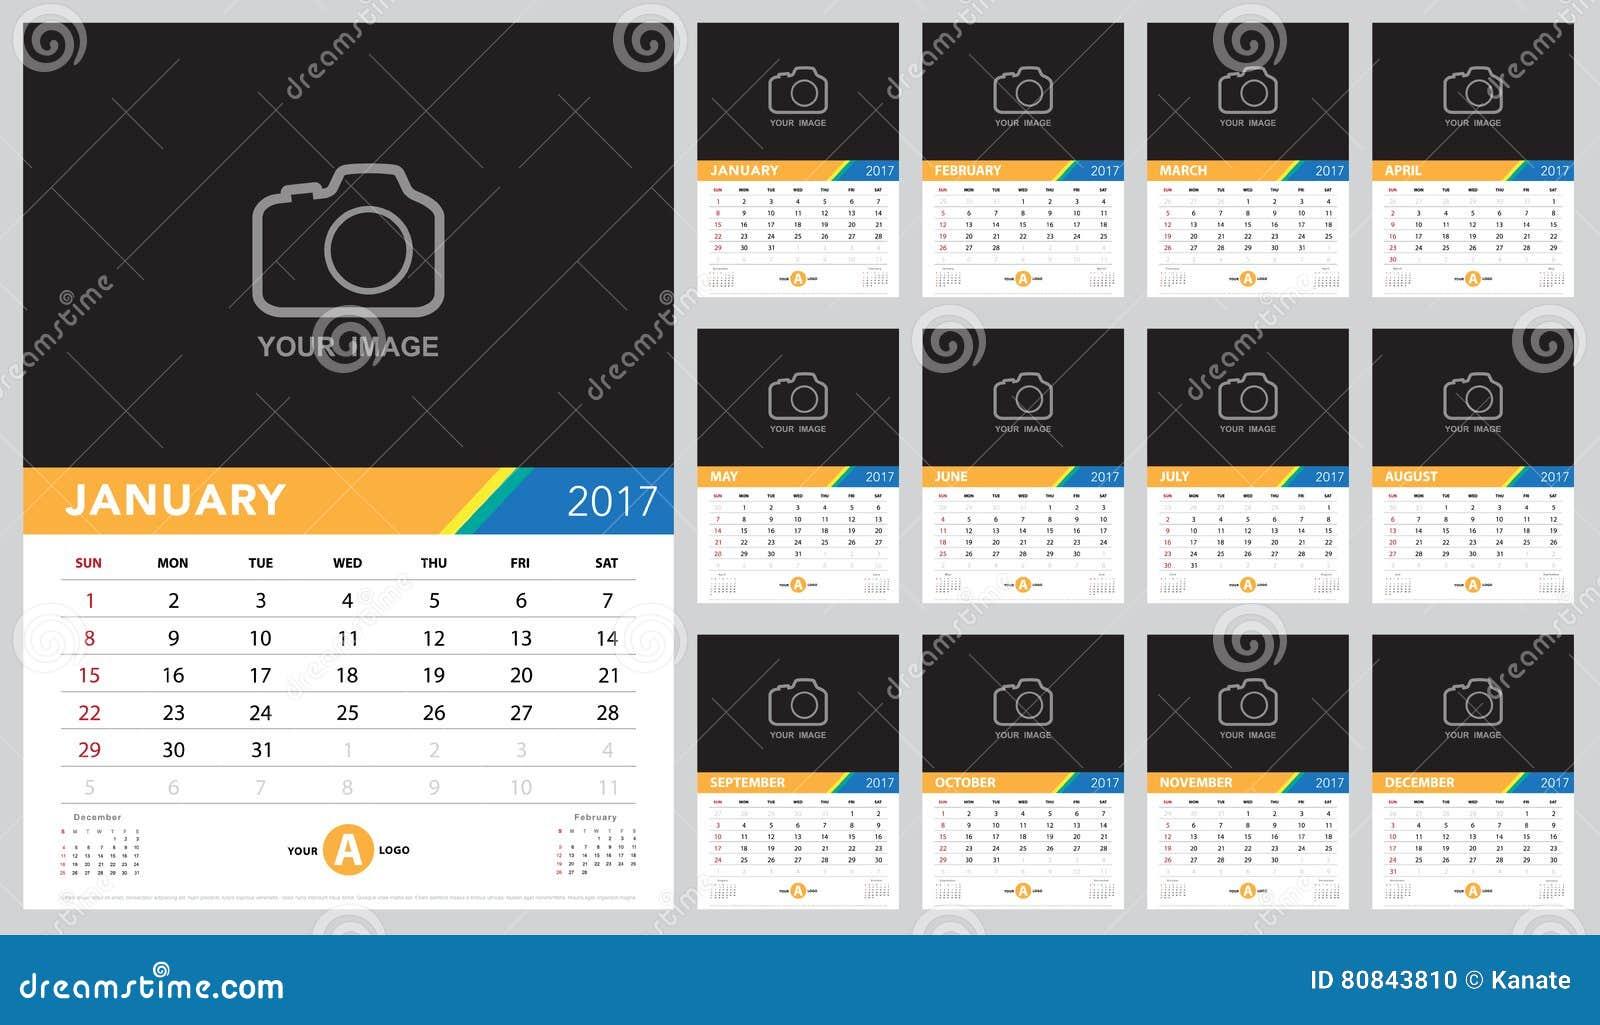 Calendar Typography Yamaha : Calendar paper note october cartoon vector